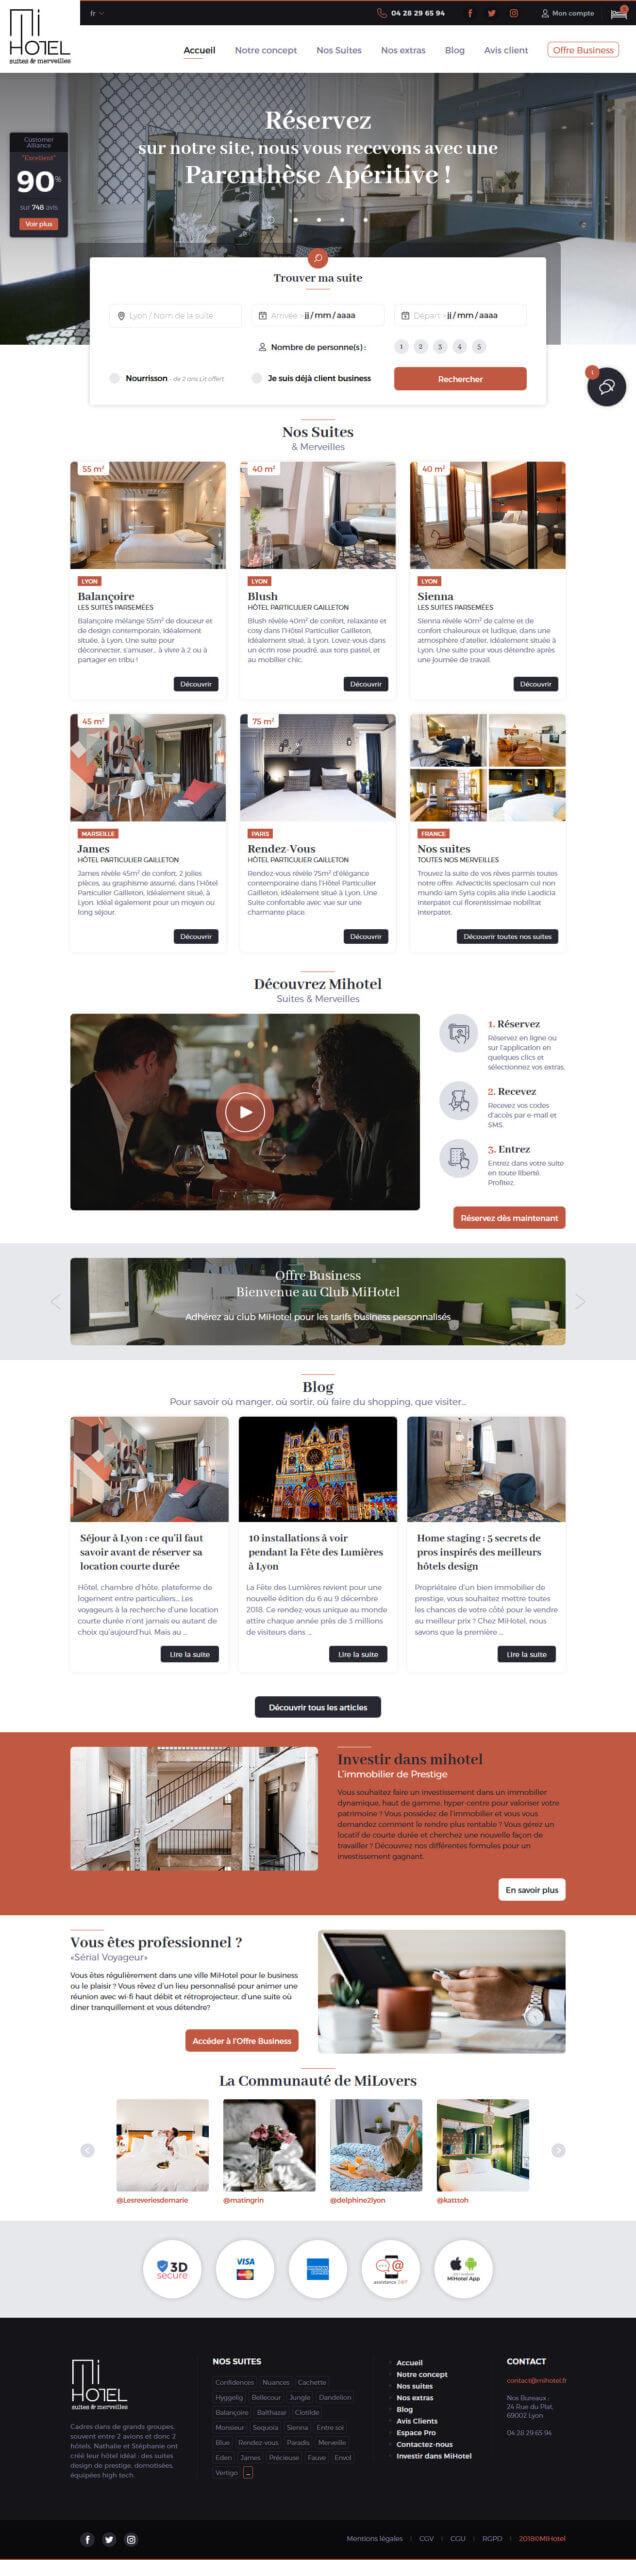 Refonte webdesign